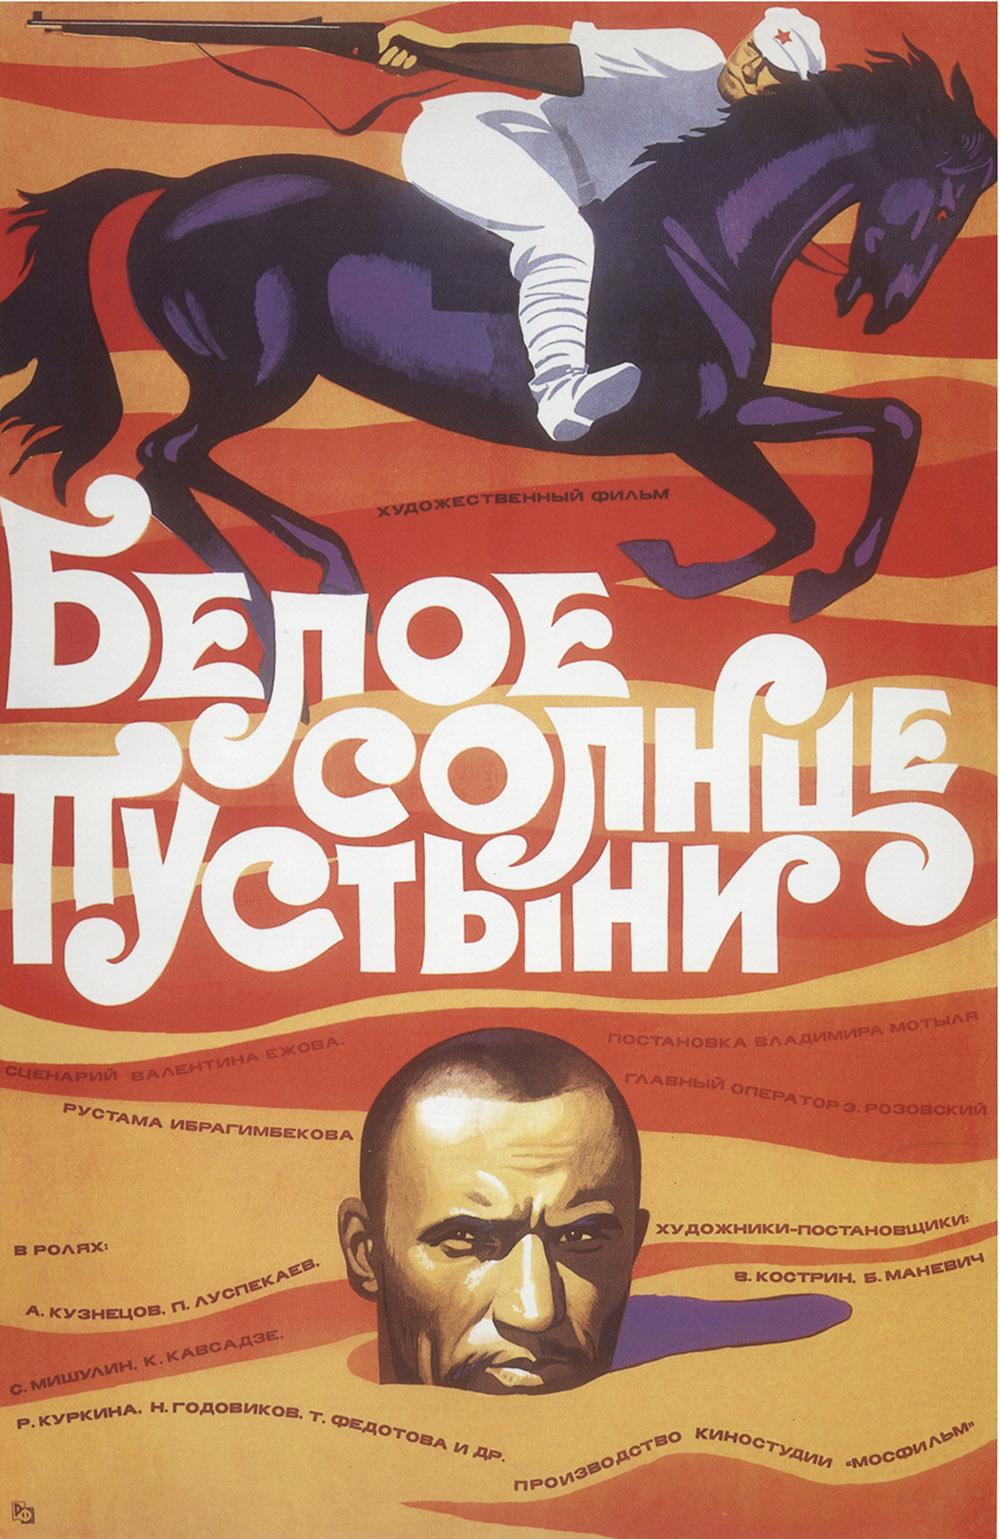 http://upload.wikimedia.org/wikipedia/ru/4/40/1970_beloe_solntse_pustyni.jpg